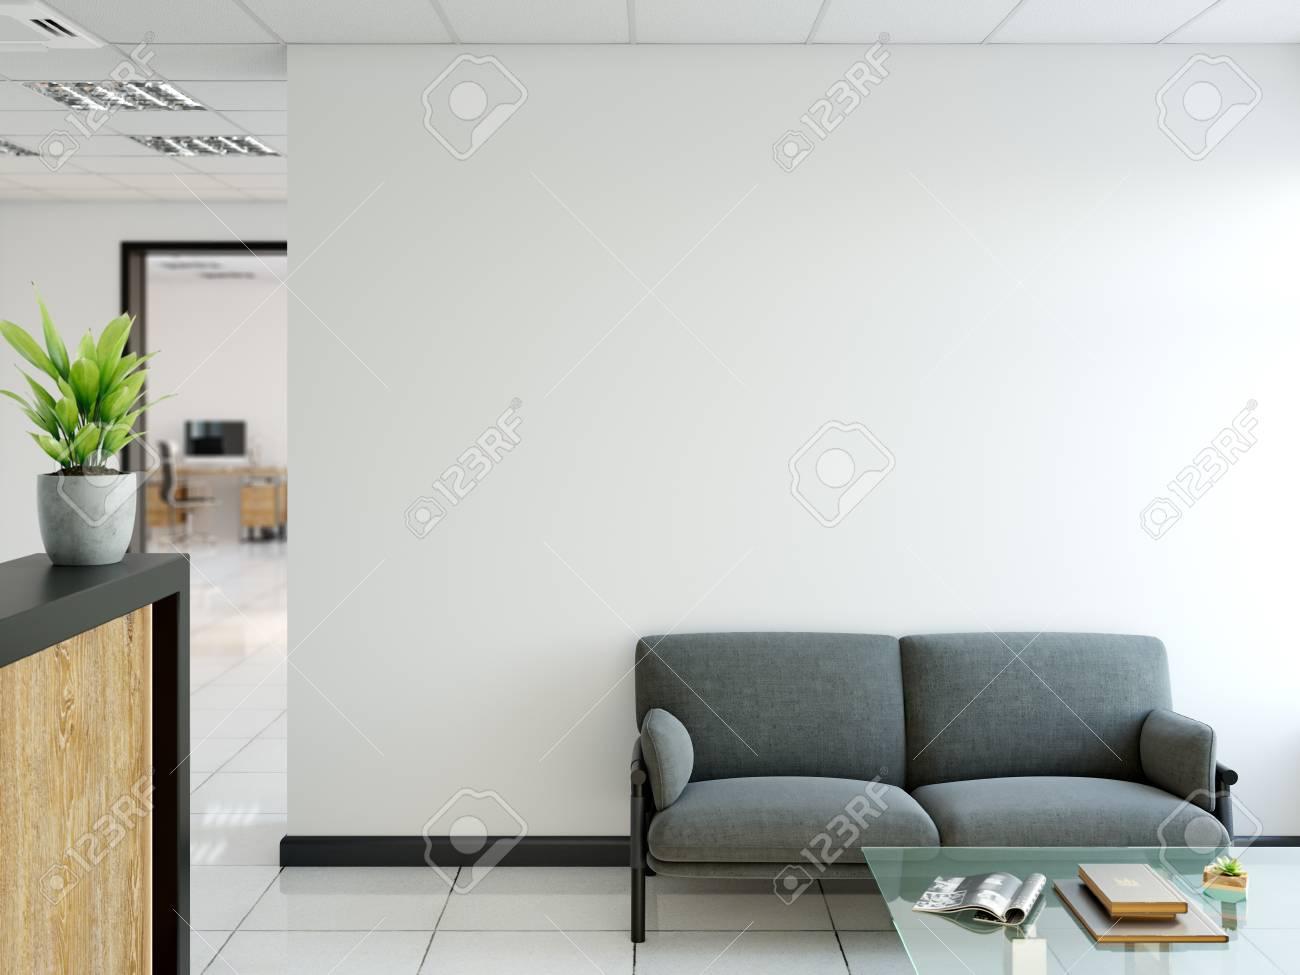 Office wall art Typography Illustration Office Wall Mock Up Interior Wall Art 3d Rendering 3d Illustration 123rfcom Office Wall Mock Up Interior Wall Art 3d Rendering 3d